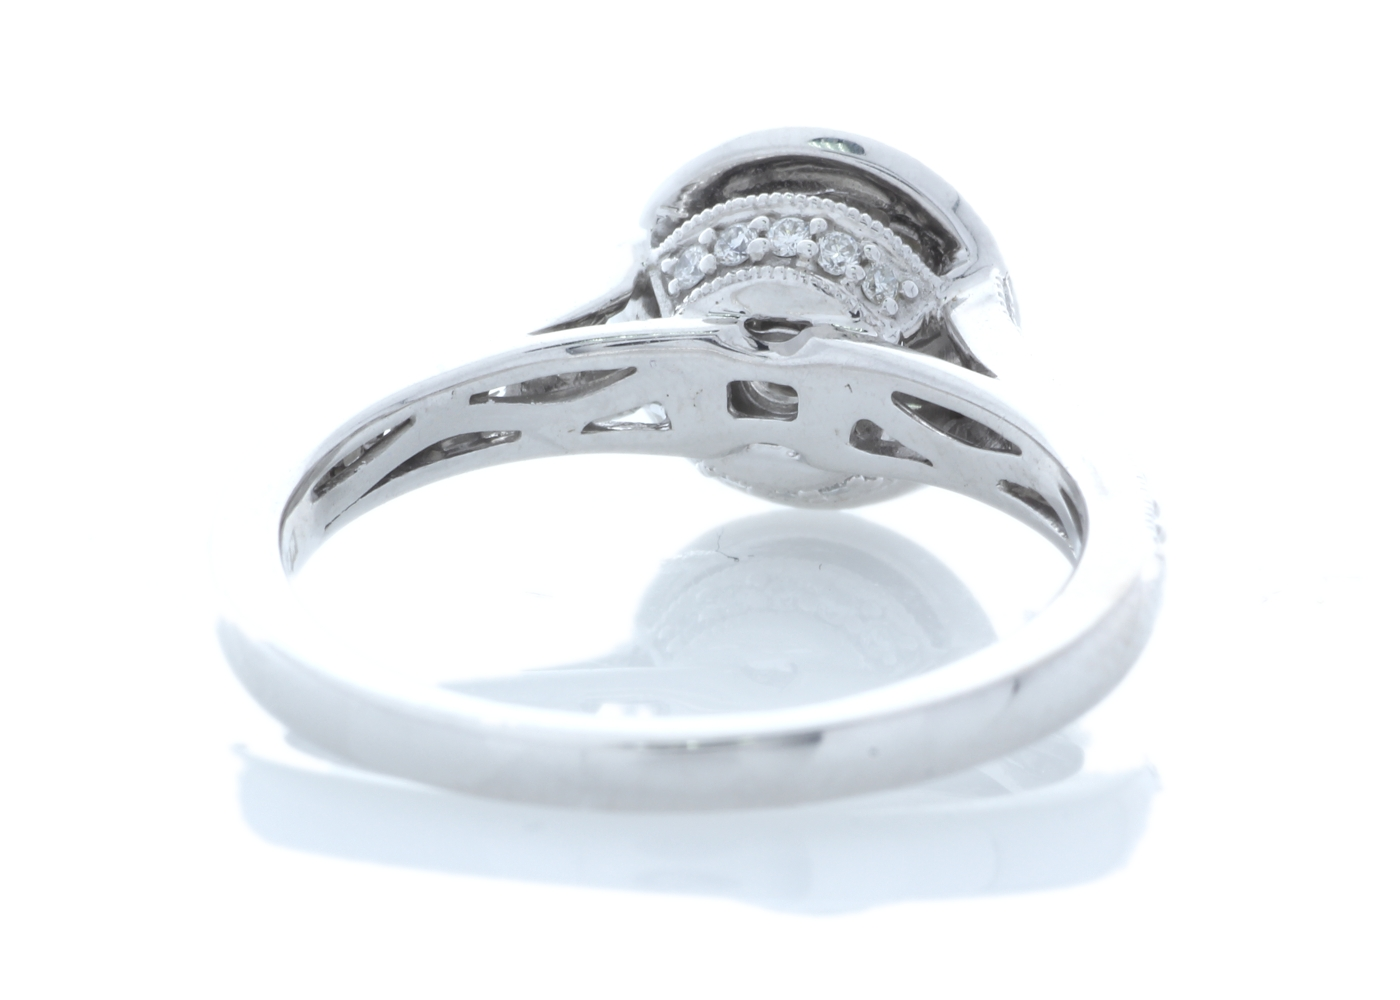 Lot 32 - 18ct White Gold Halo Set Ring 0.91 Carats